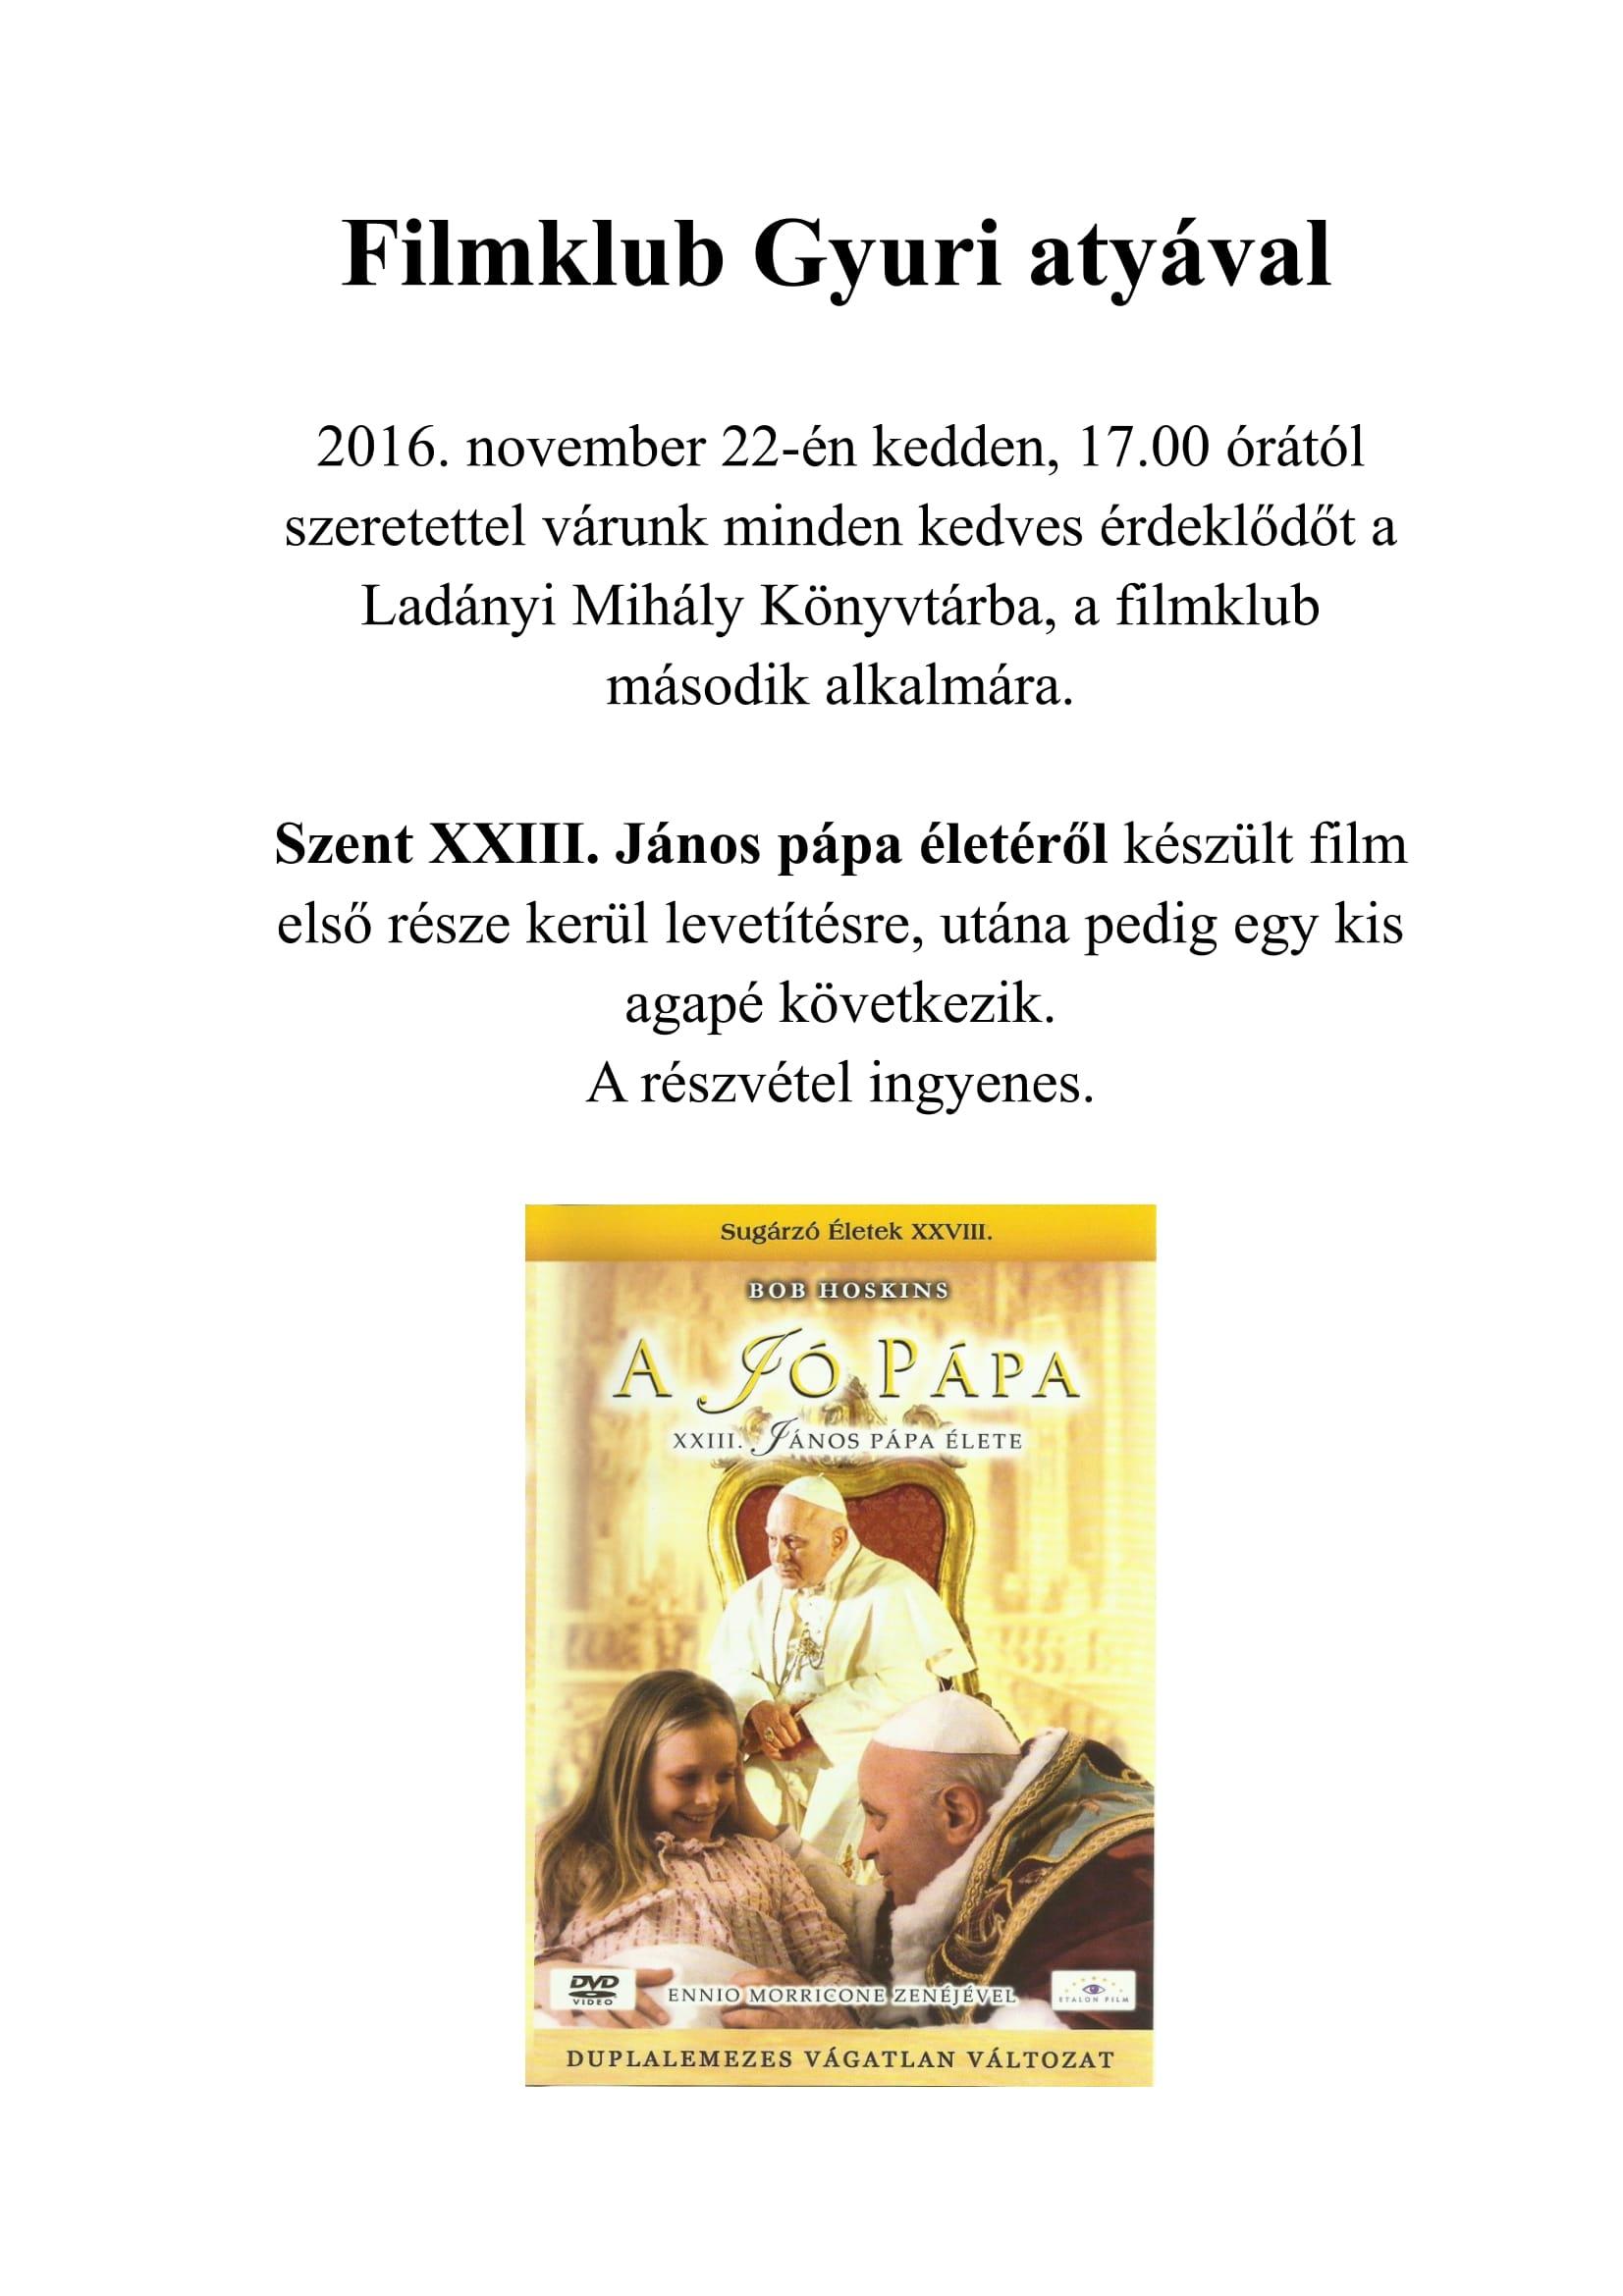 filmklub-gyuri-atyaval